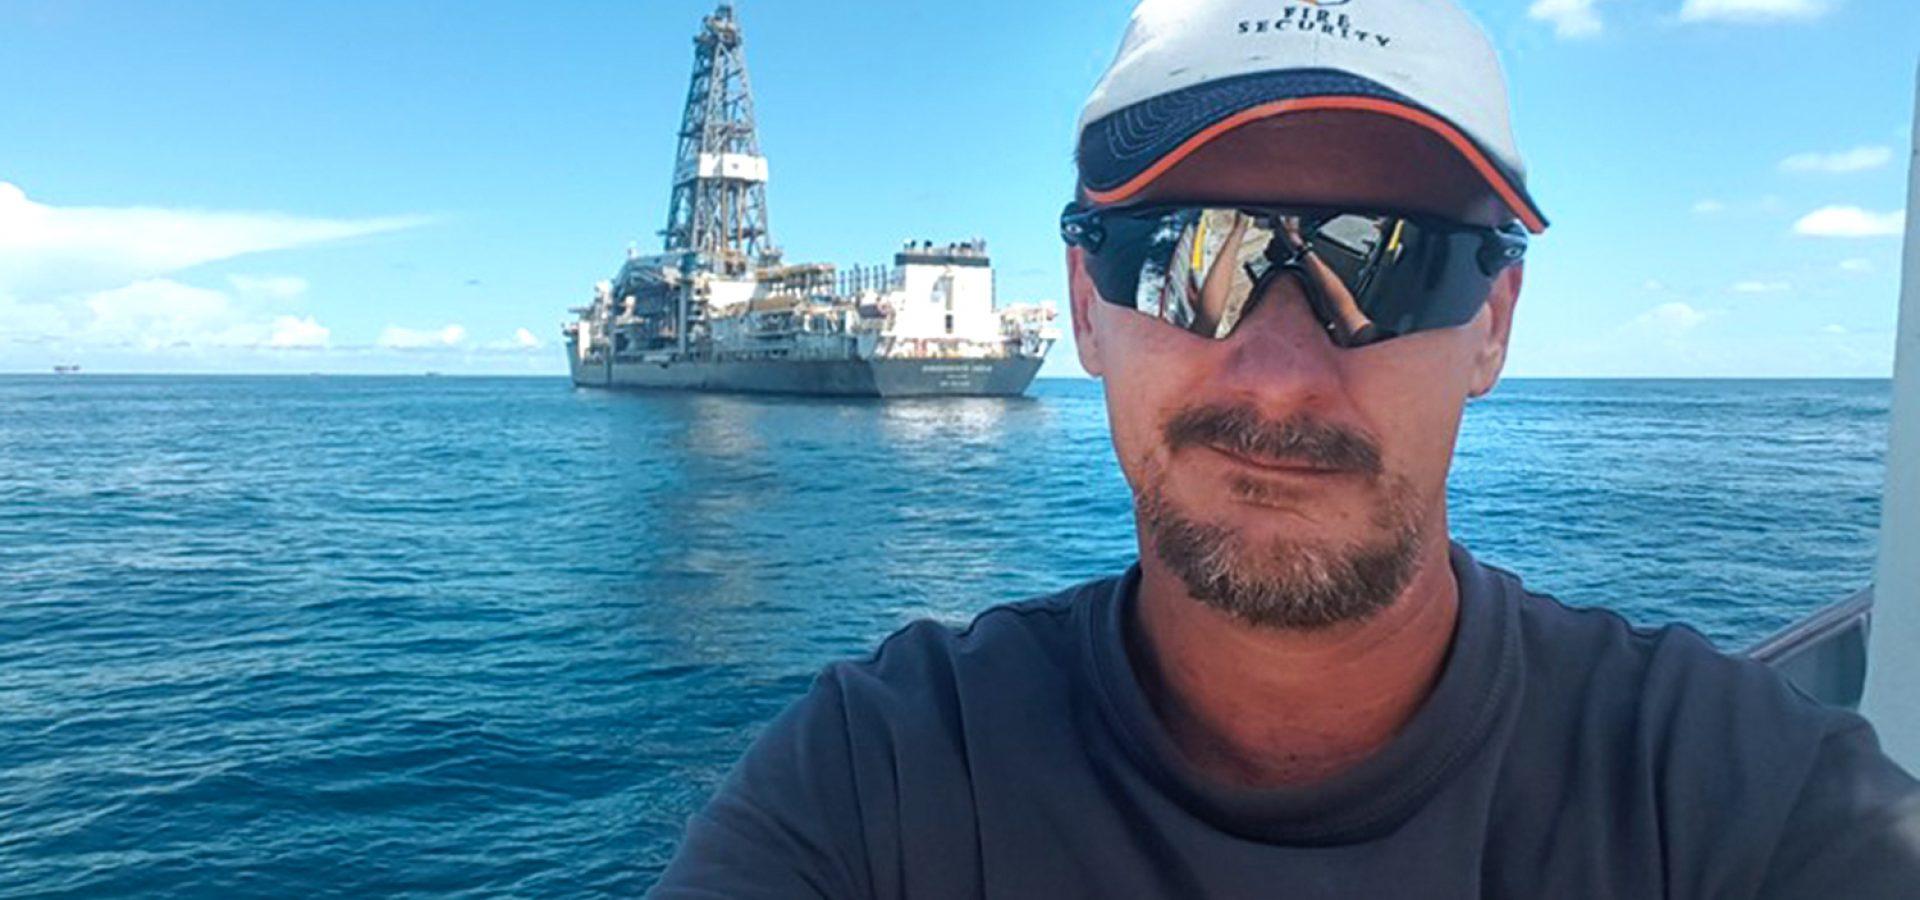 Paul Filby having just surveyed Transocean Drill Ship Transocean India, offshore Louisiana USA